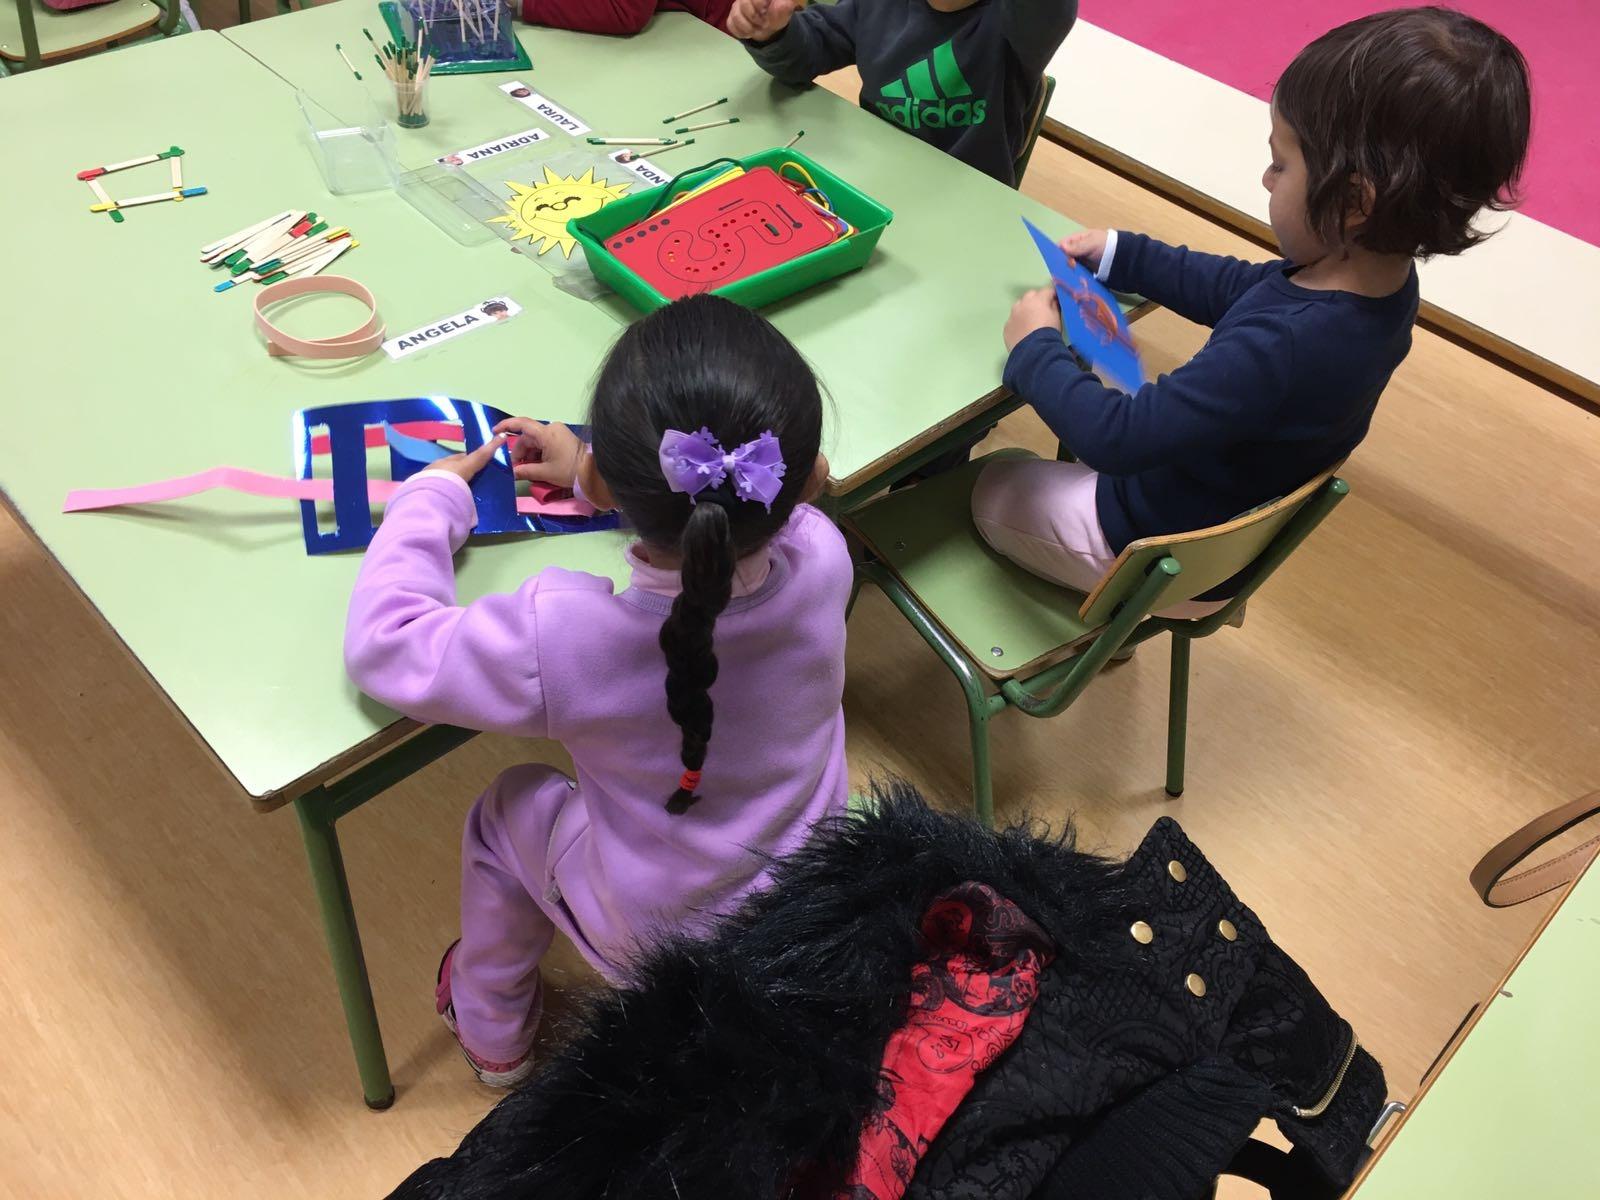 E. Infantil y sus proyectos 10